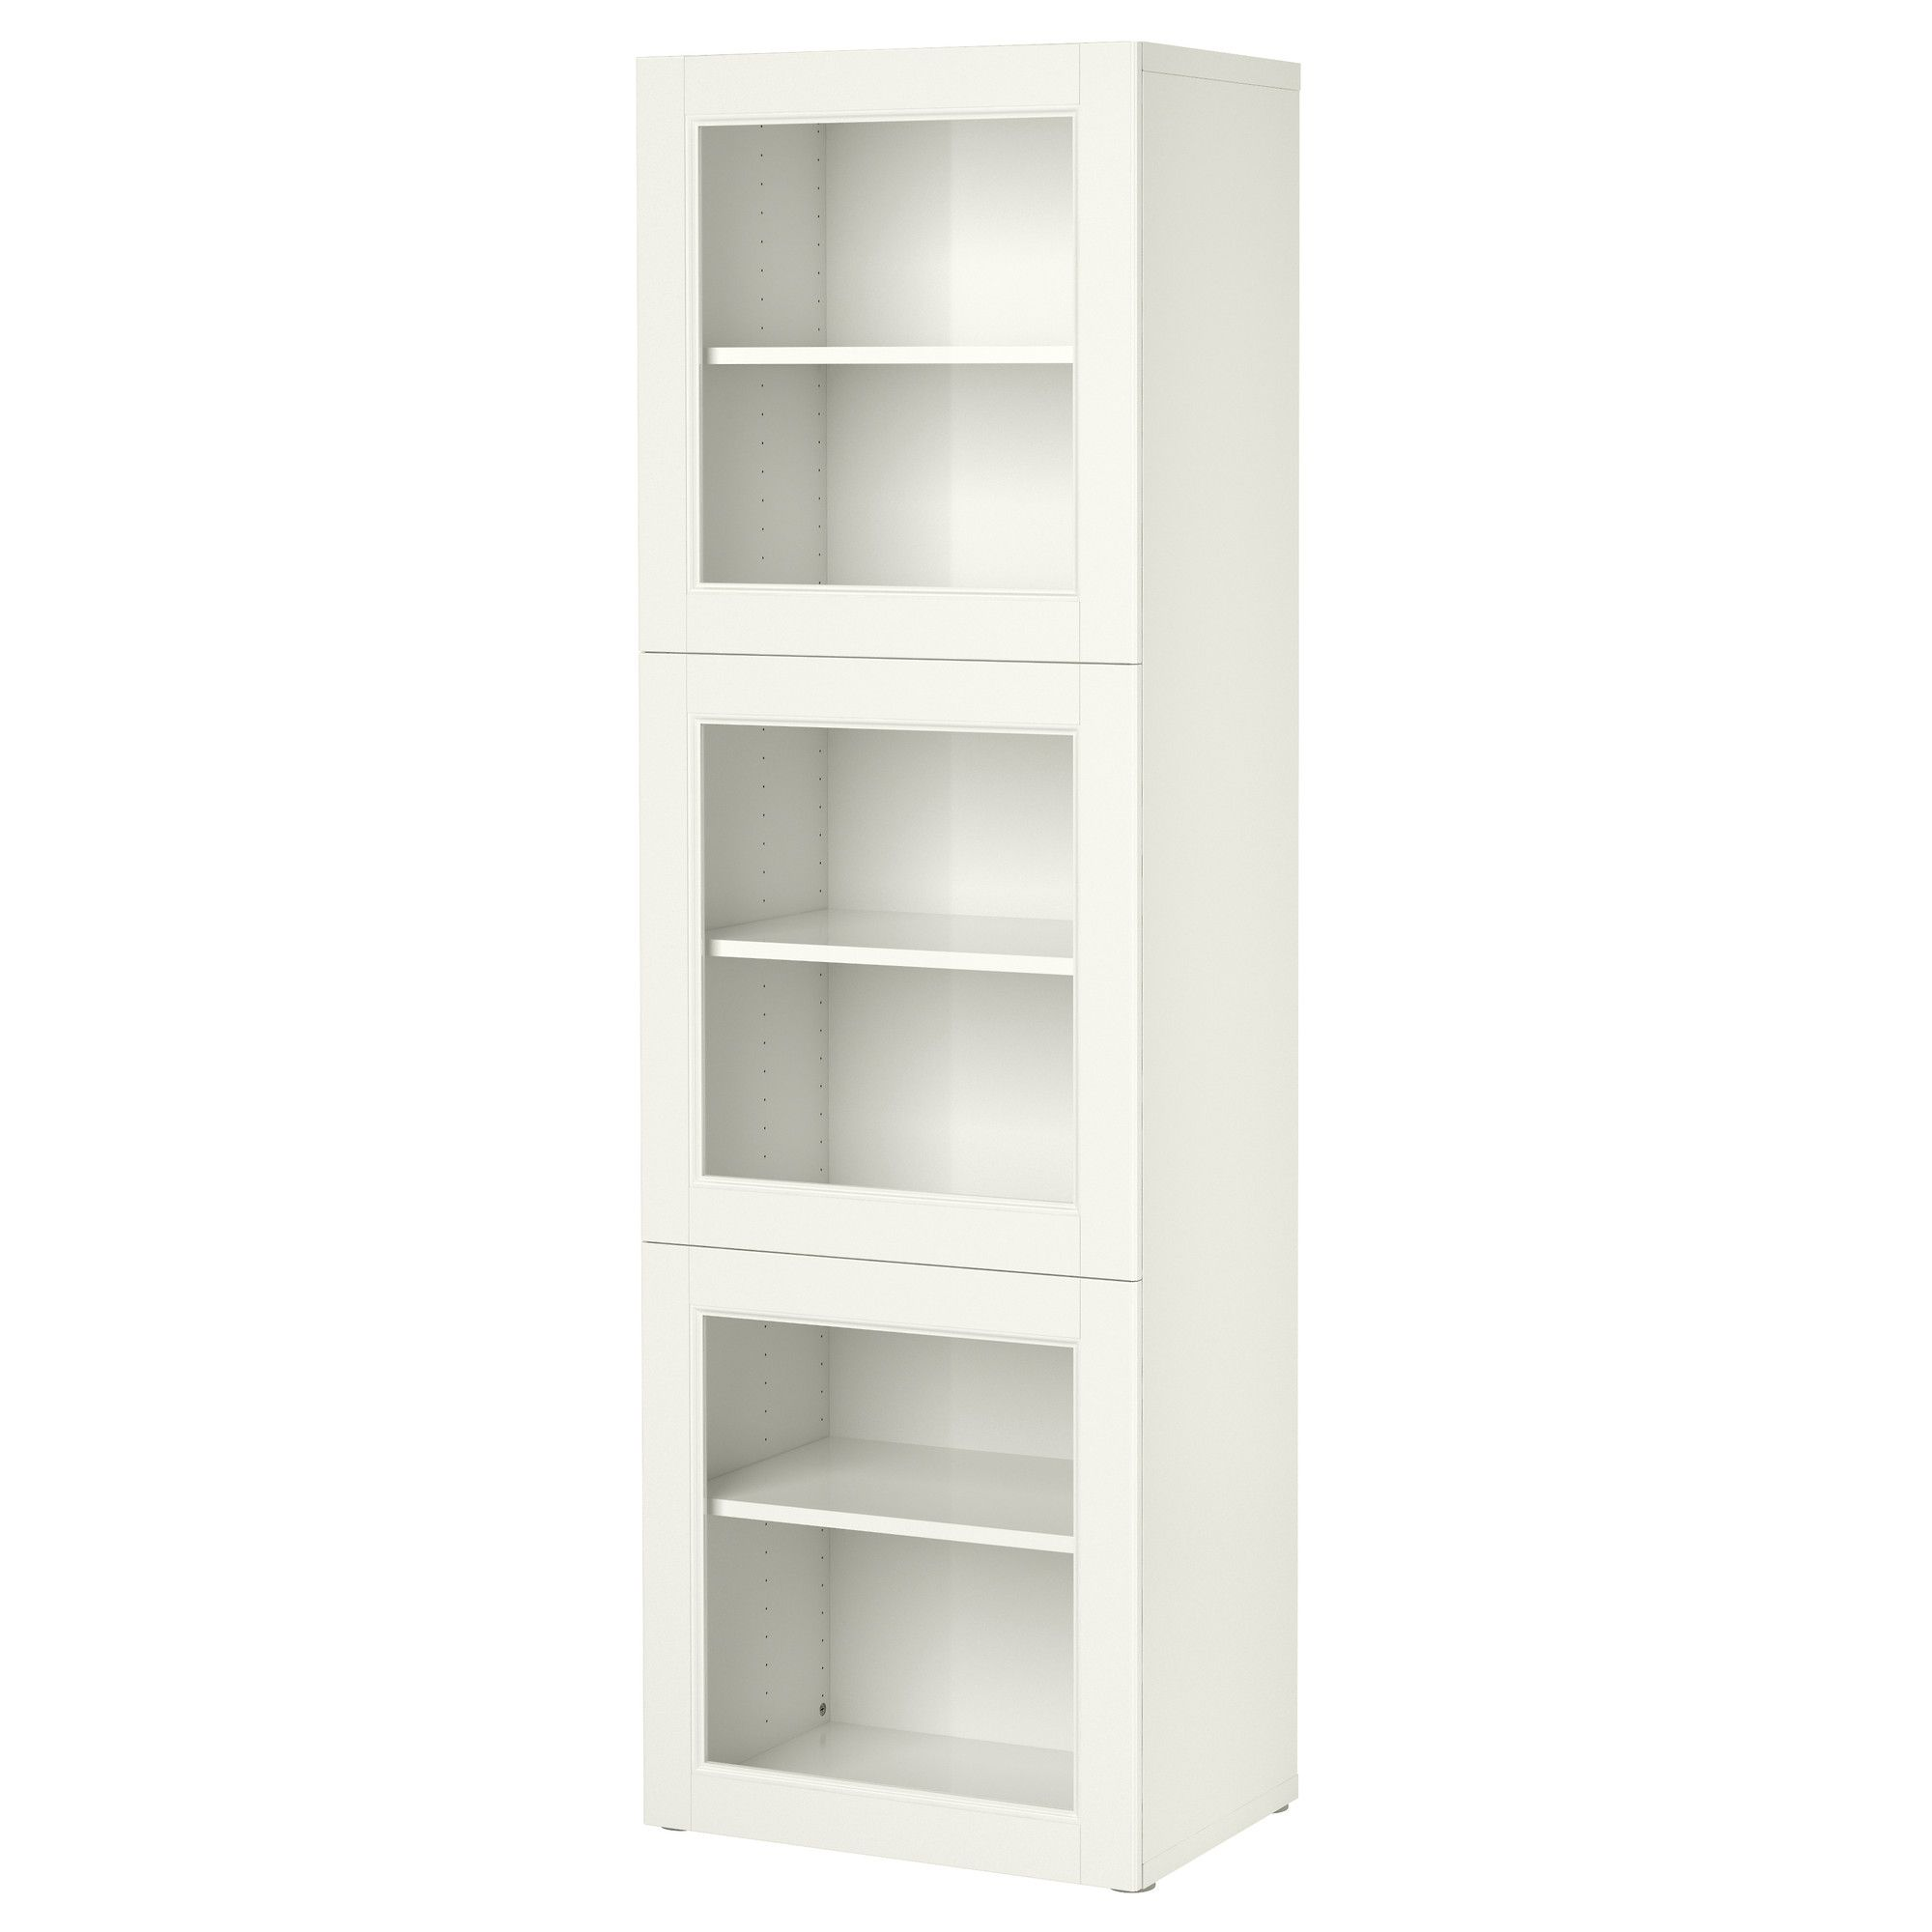 bestà storage unit white ikea 130 23 5 8 width x 15 75